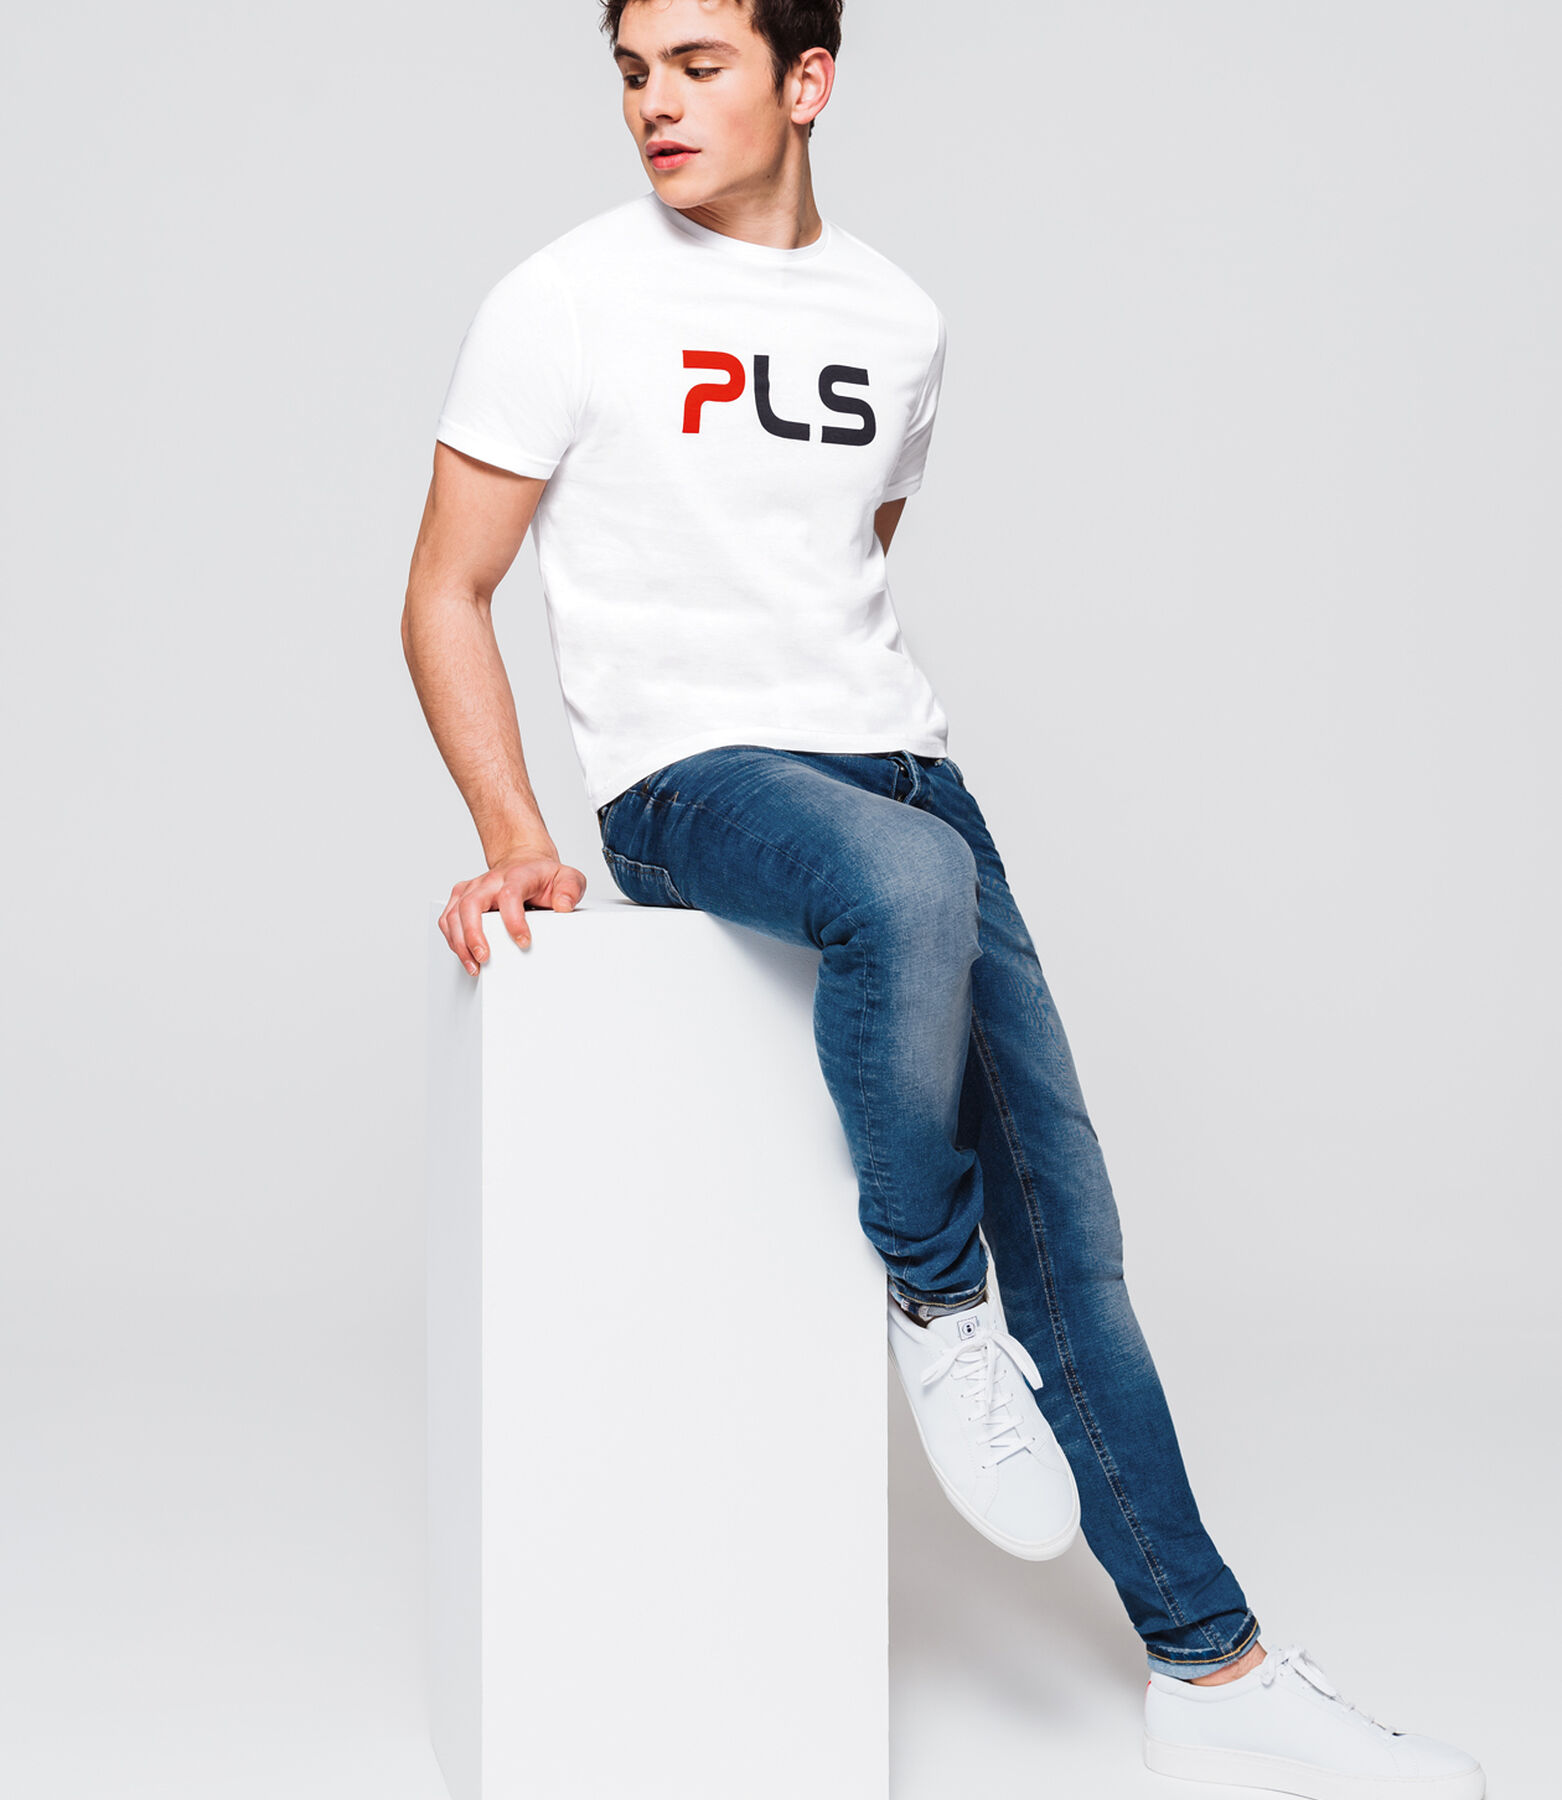 T-shirt message PLS